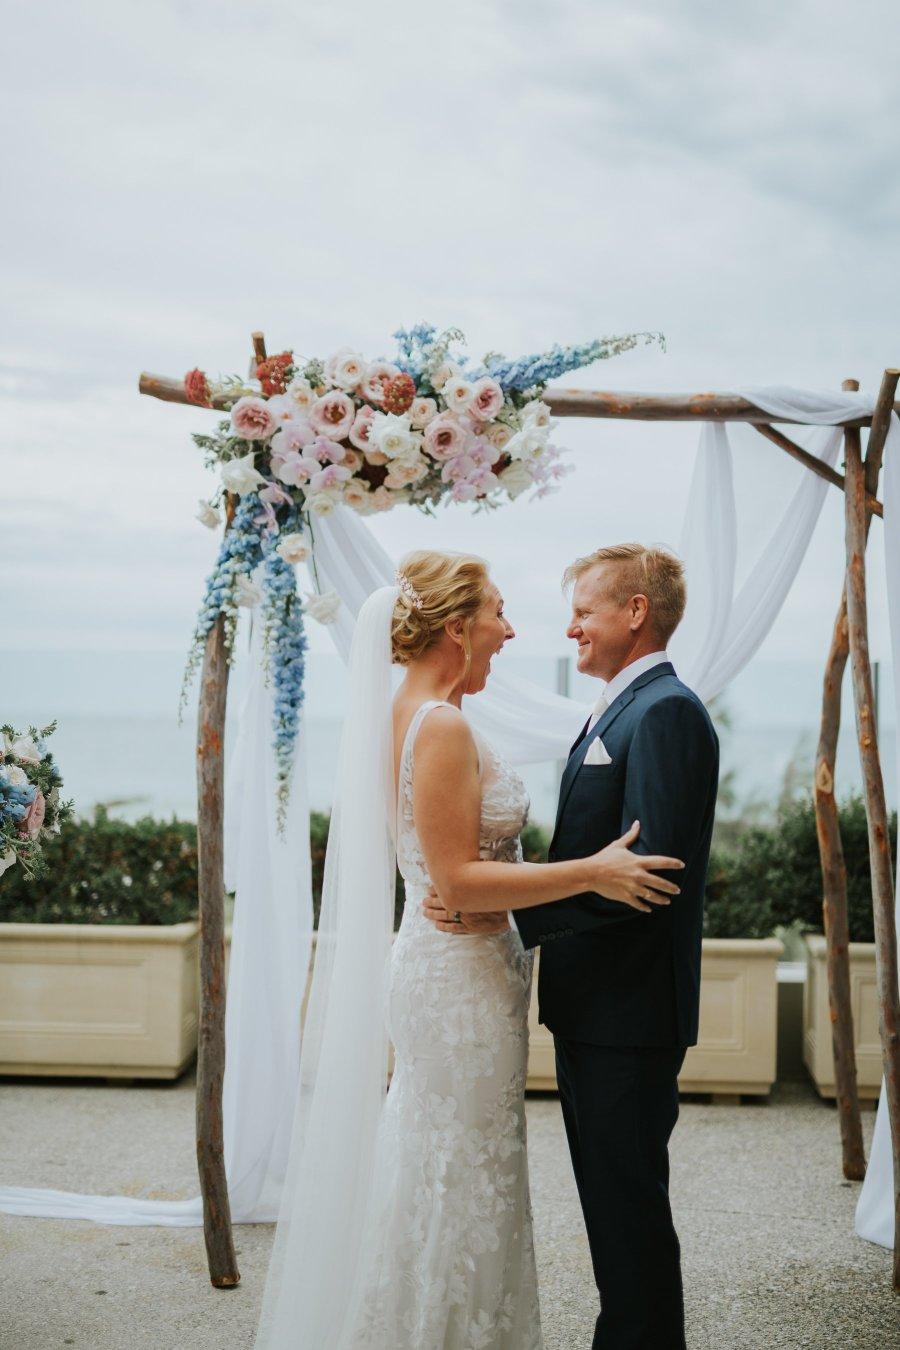 Kate + Graeme | Mindarie Wedding | Ebony Blush Photography | Zoe Theiadore | Perth wedding Photographer110